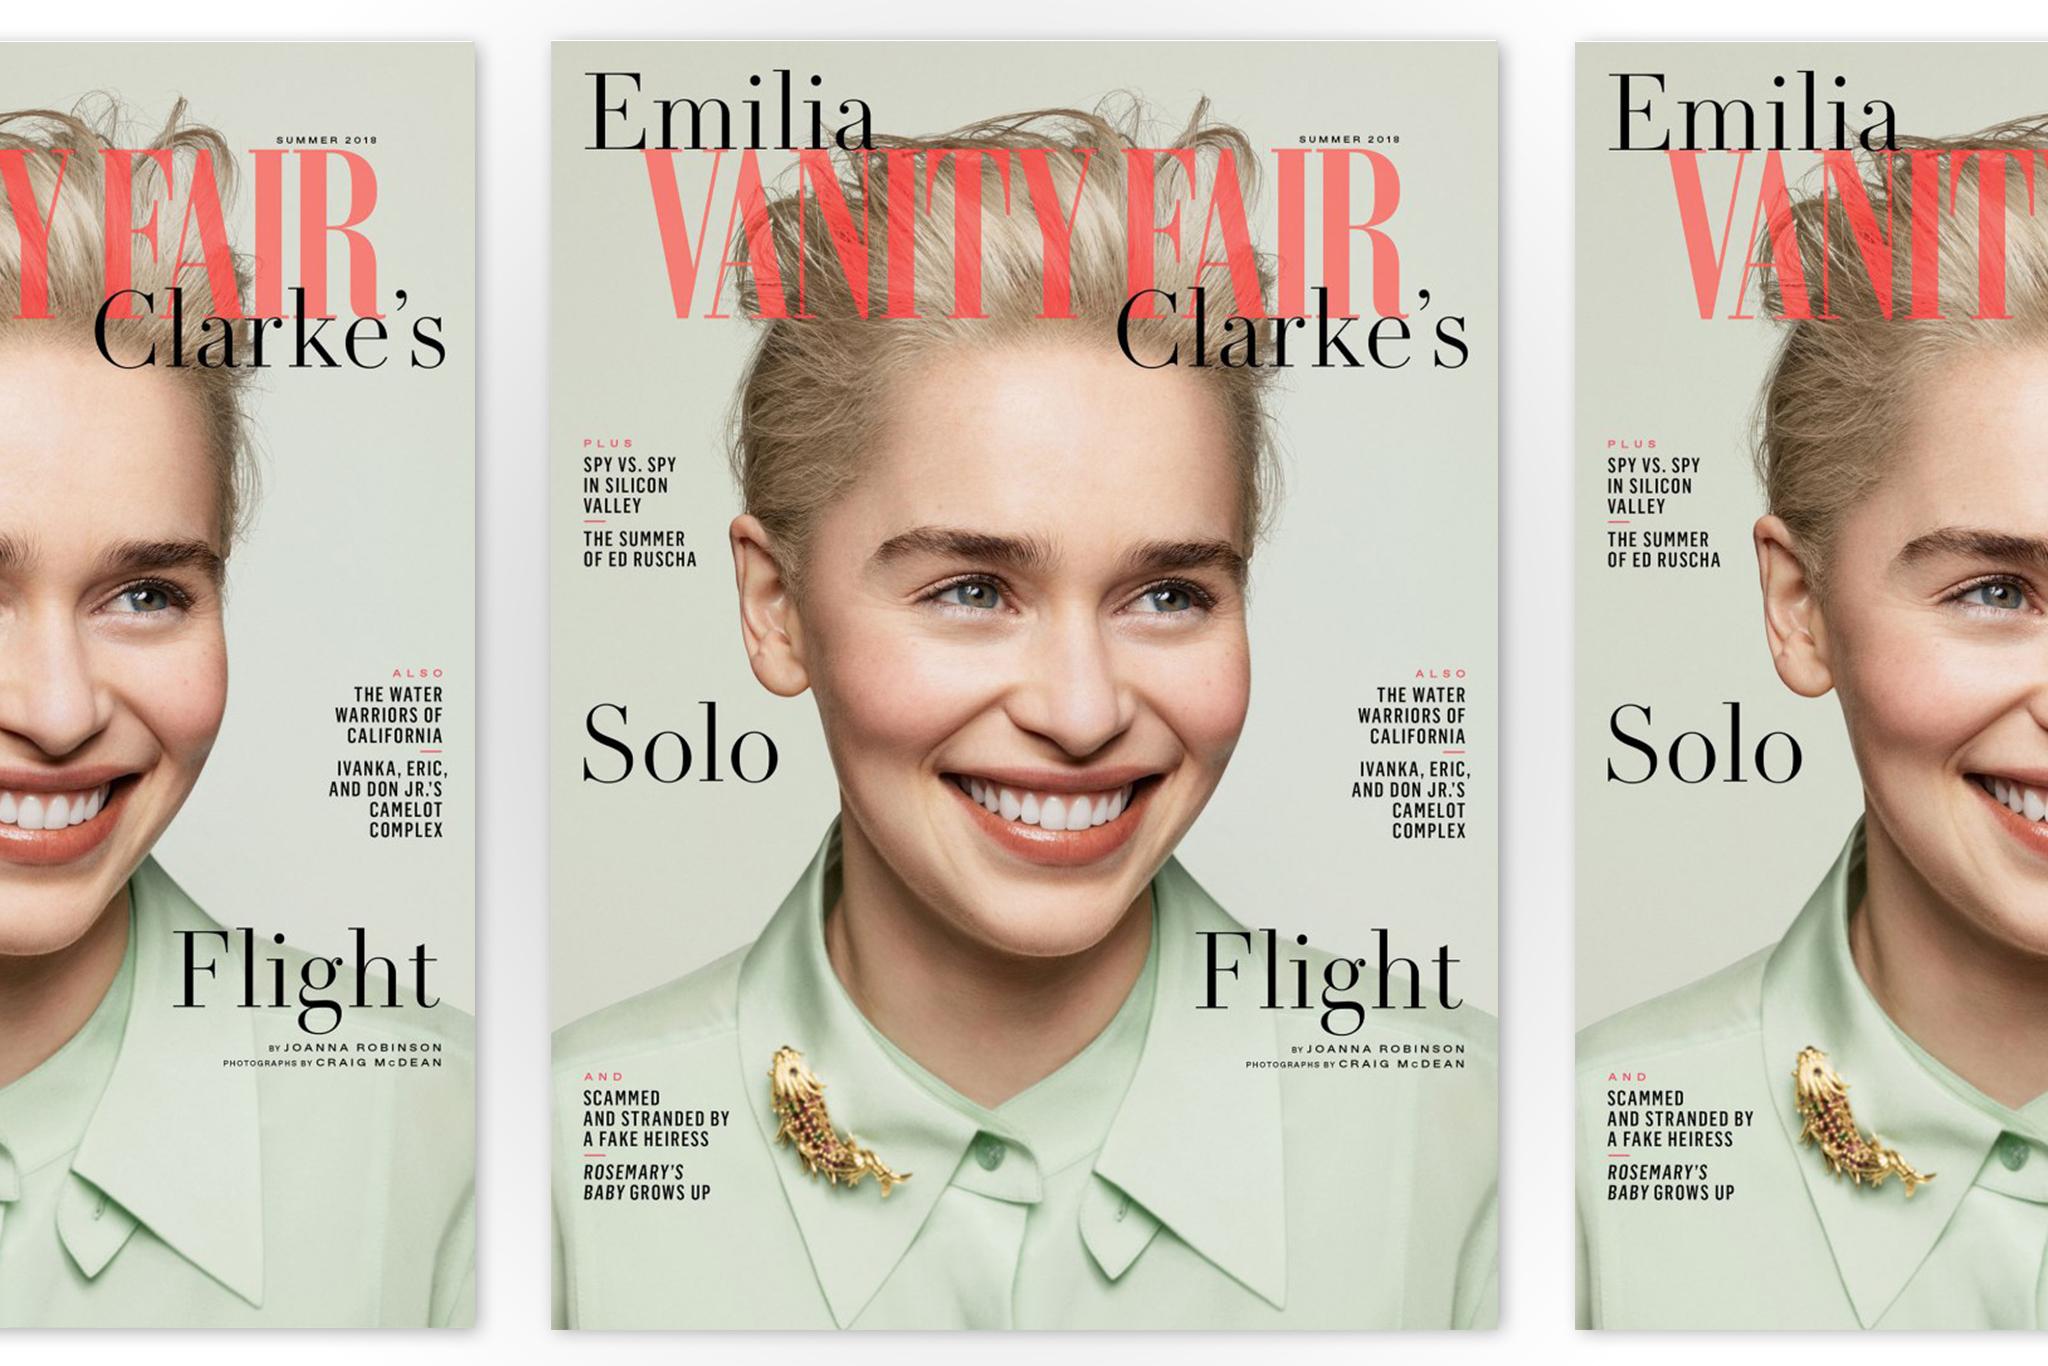 Emilia-Clarke-VF-1